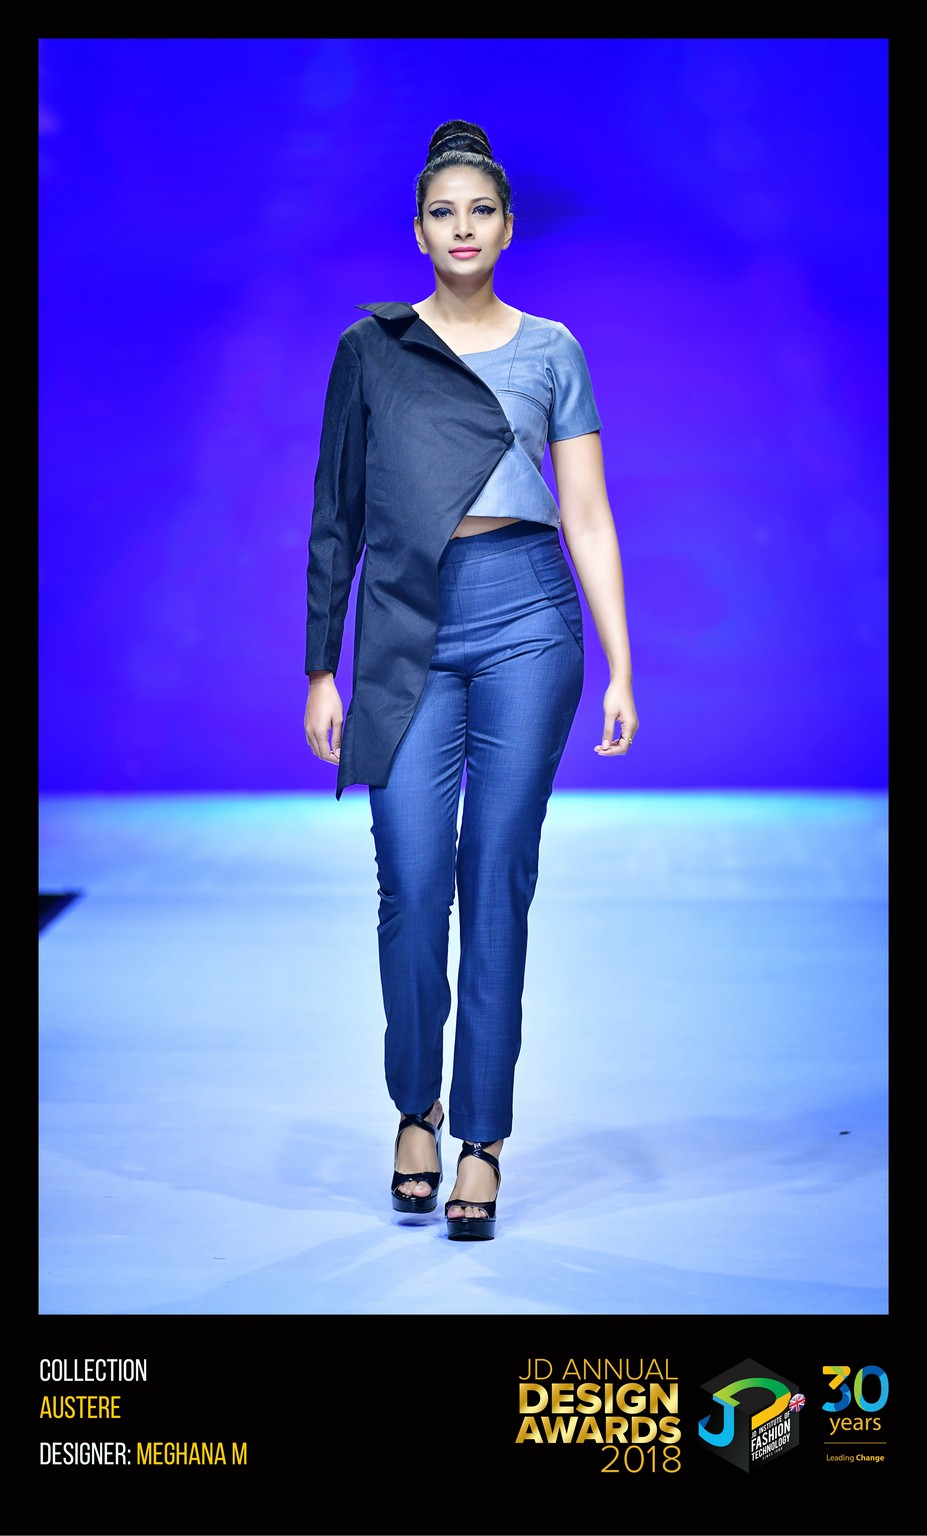 Austere – Change – JD Annual Design Awards 2018   Designer: Meghana   Photography : Jerin Nath (@jerin_nath) austere - AUSTERE3 - Austere – Change – JD Annual Design Awards 2018